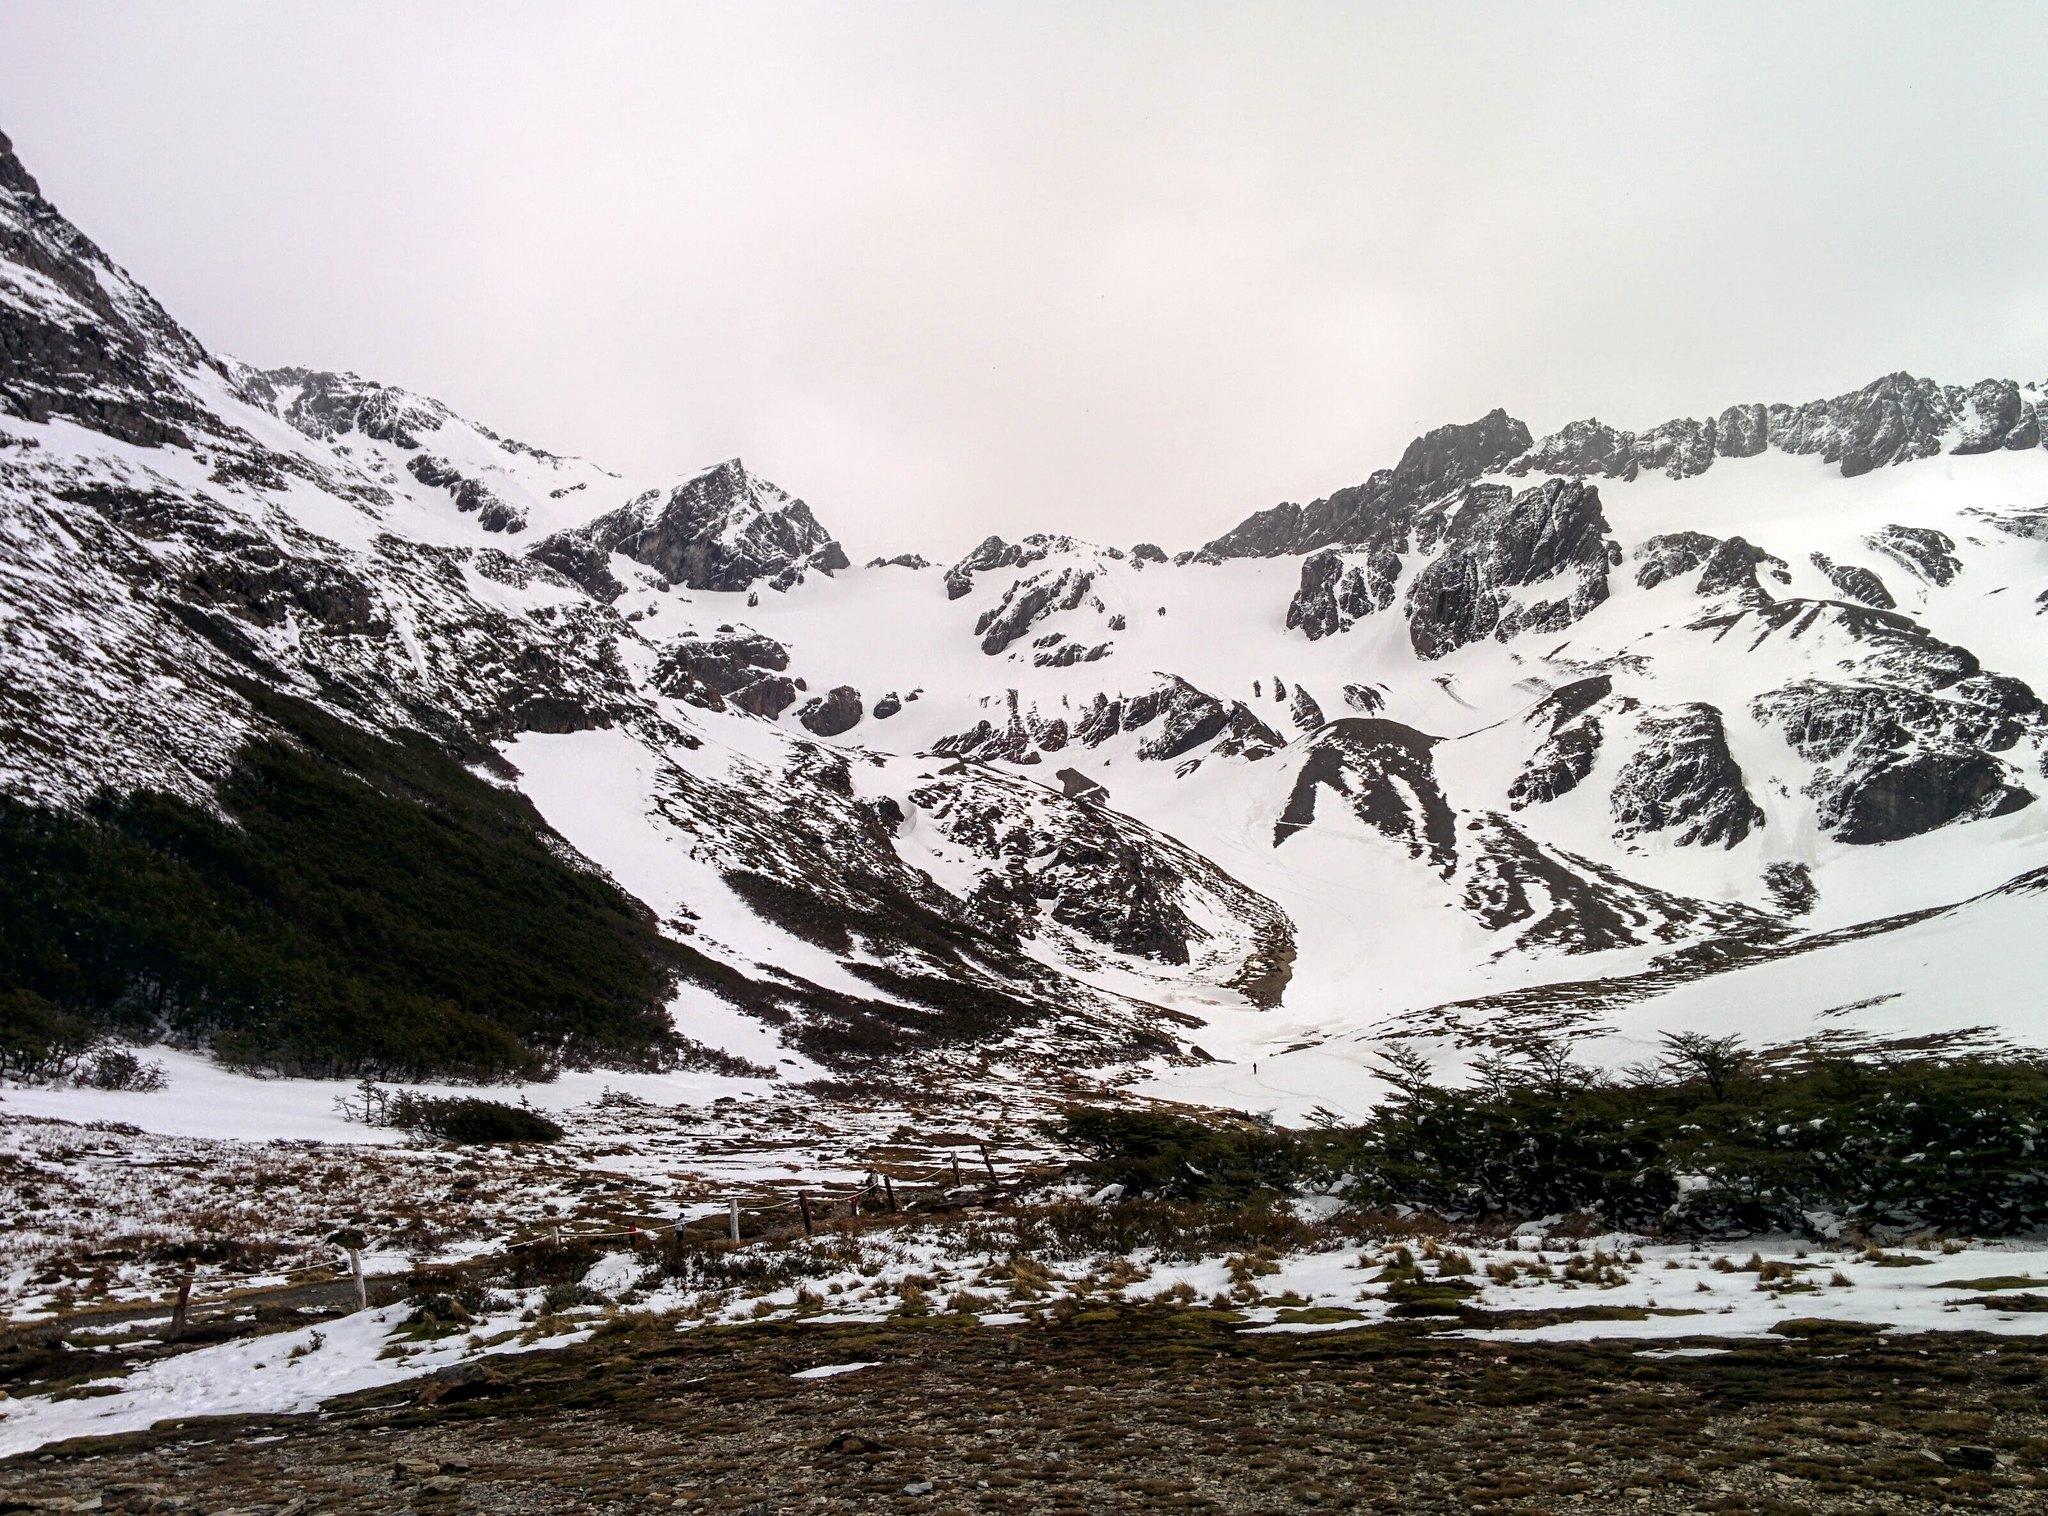 Martial glacier covered in snow